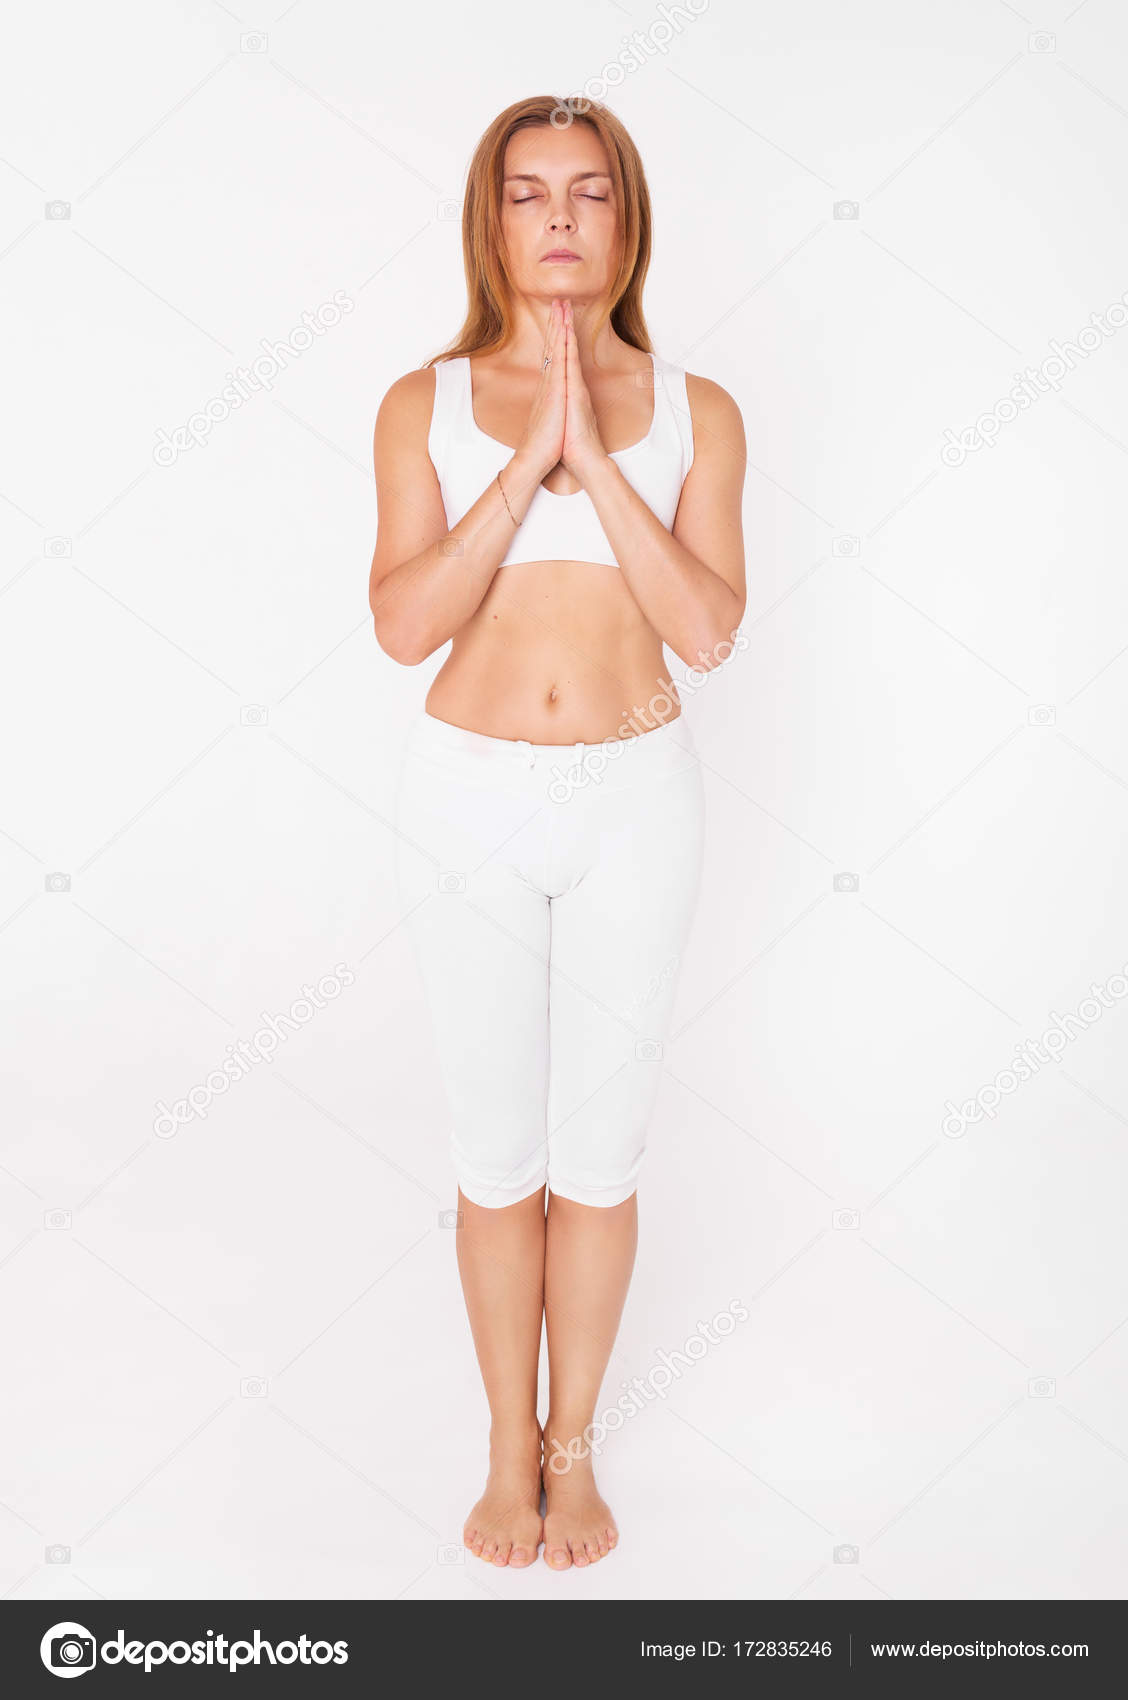 Adult Woman Doing Yoga Woman Standing Namaste Yoga Pose On A White